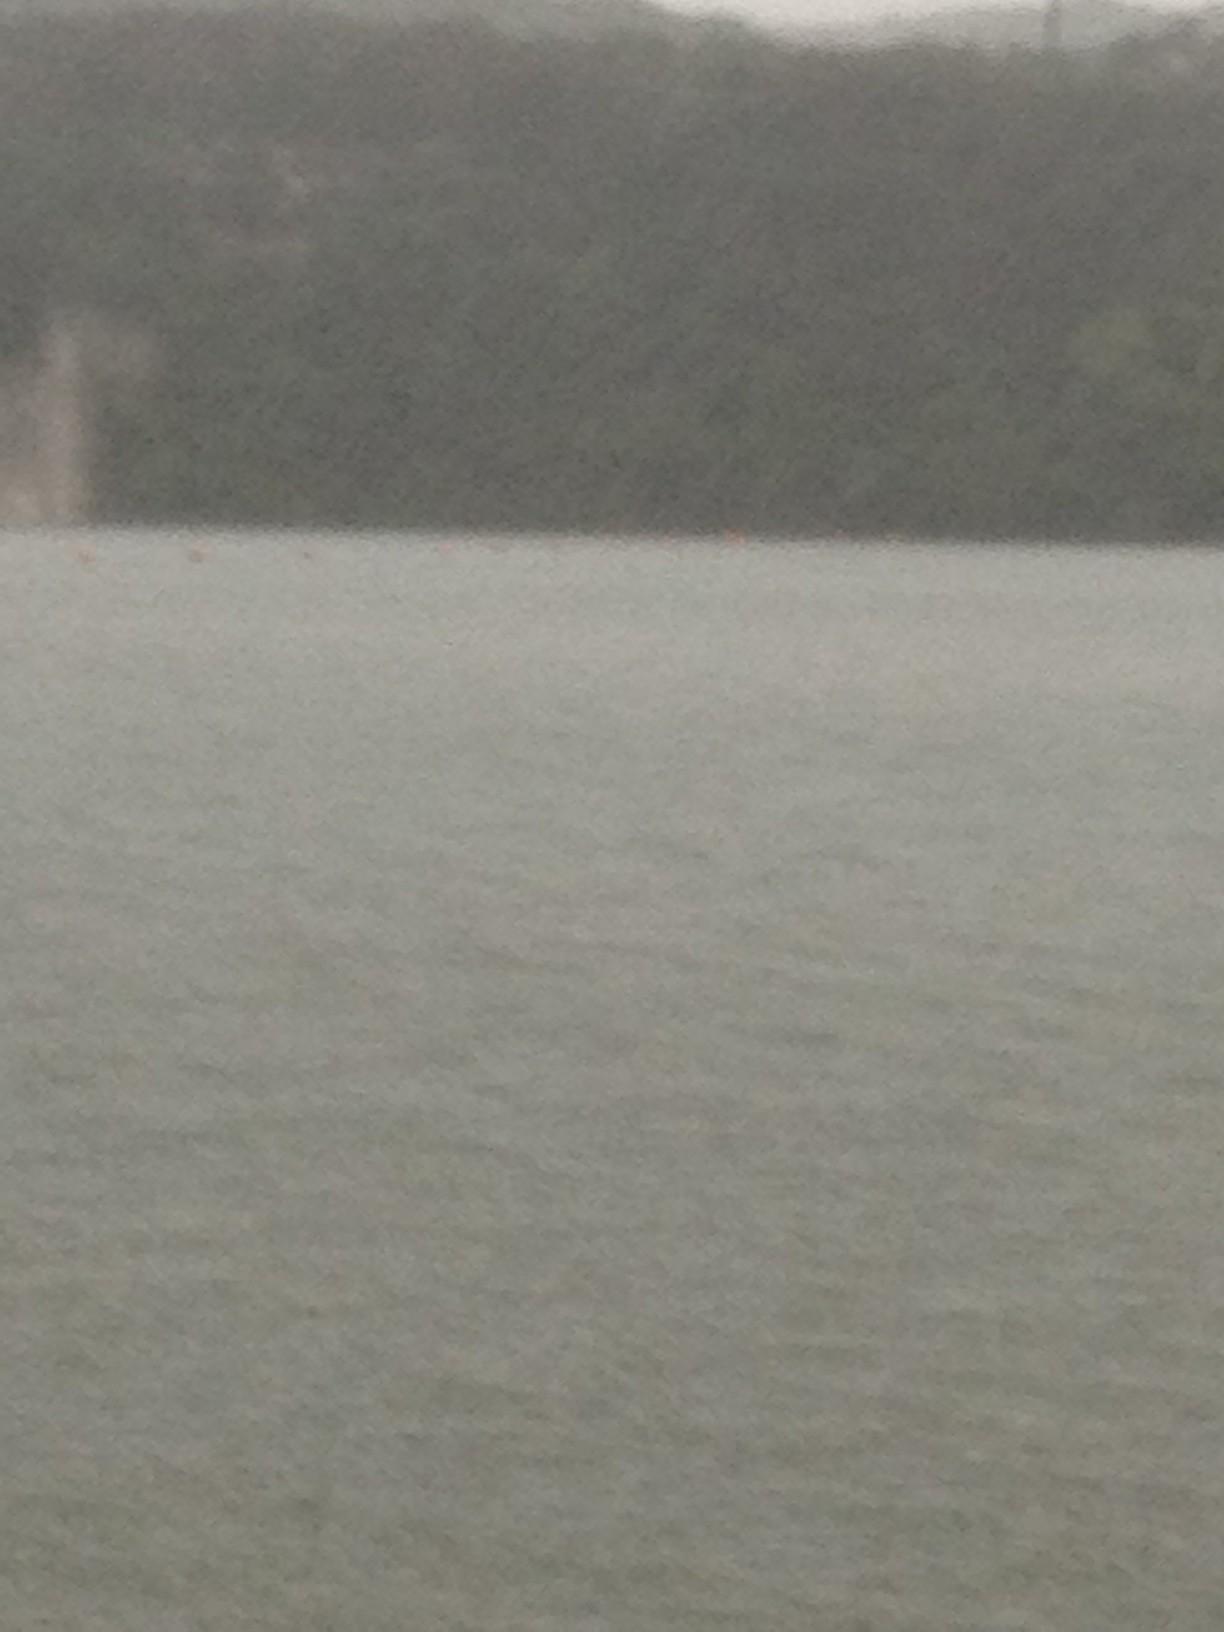 Let it rain! #ATX http://t.co/726DlB0R